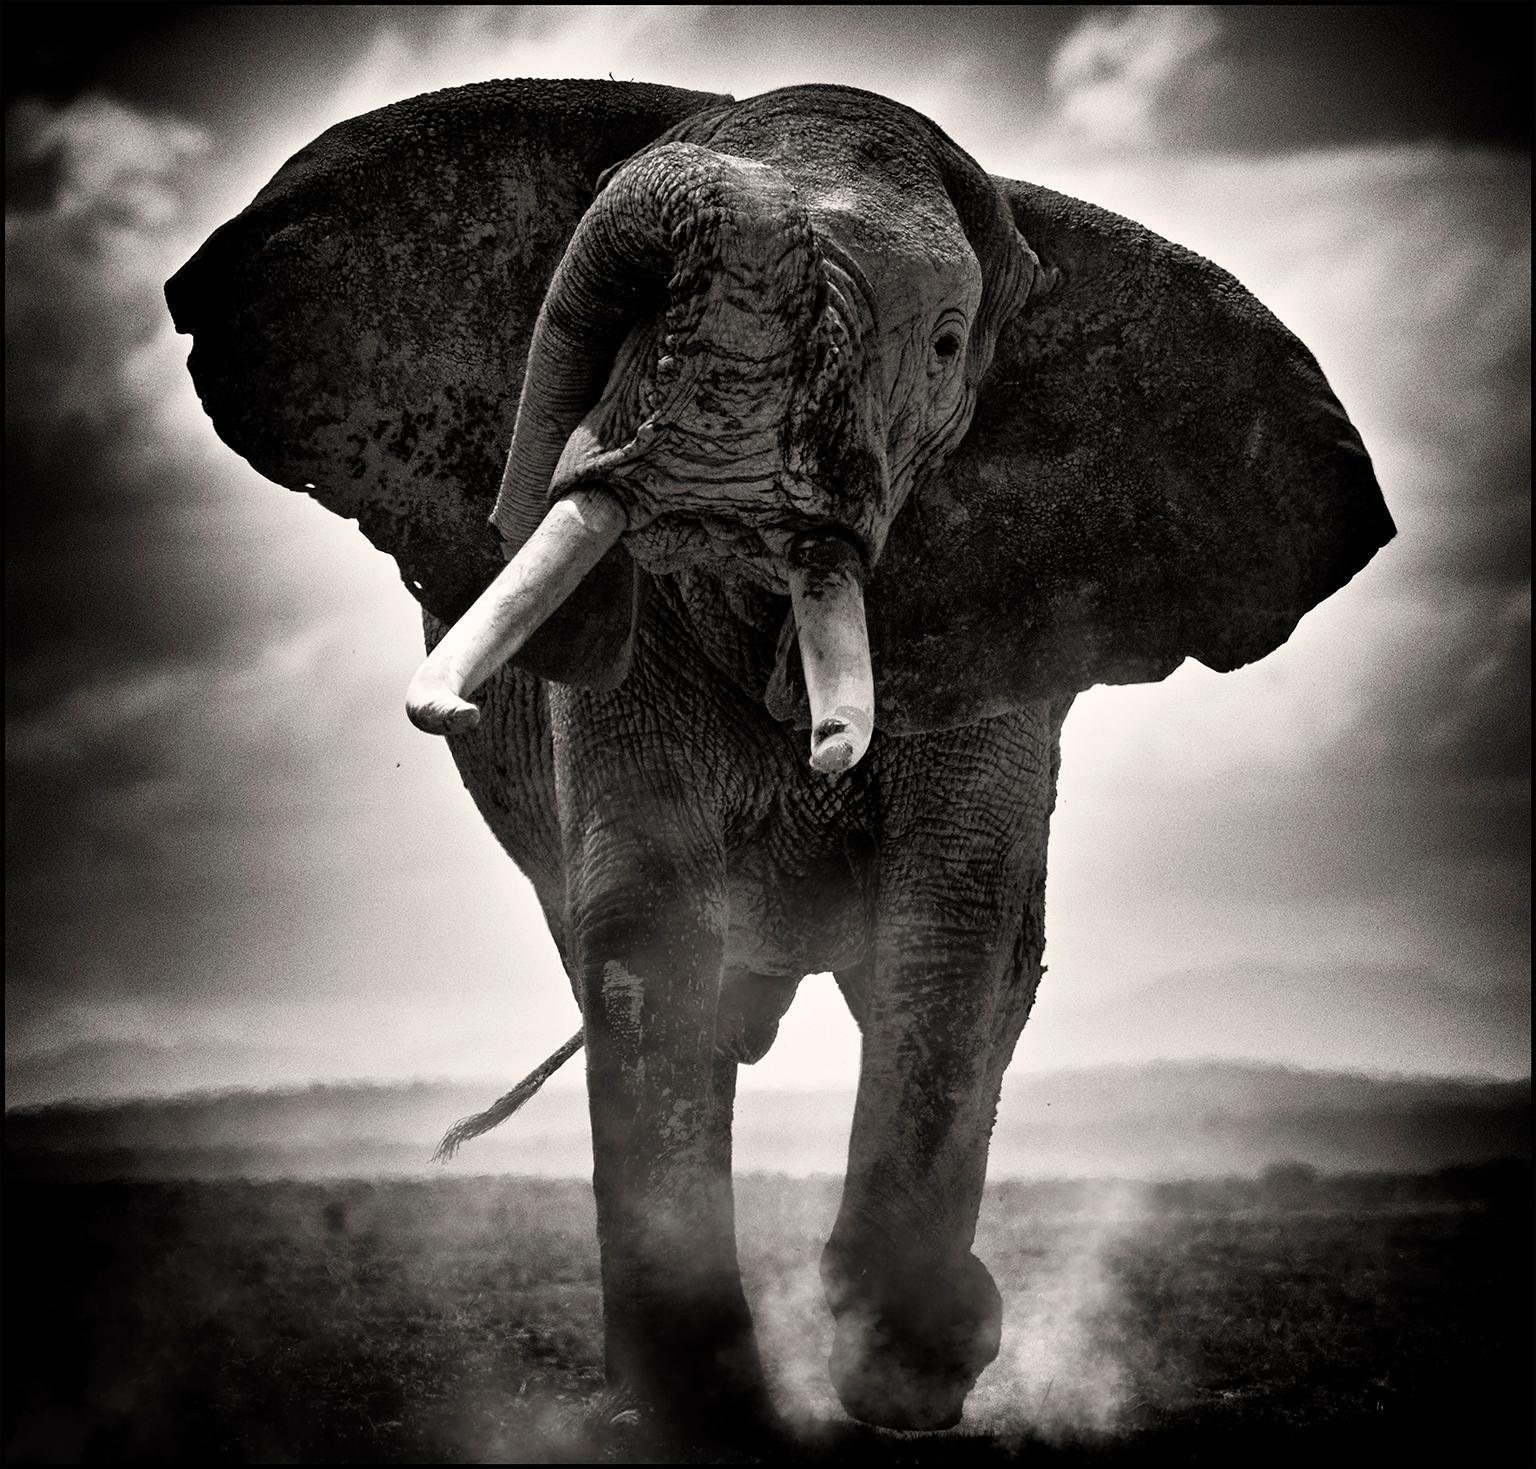 POWER II, Kenya, Elephant, b&w photography, Africa, Portrait